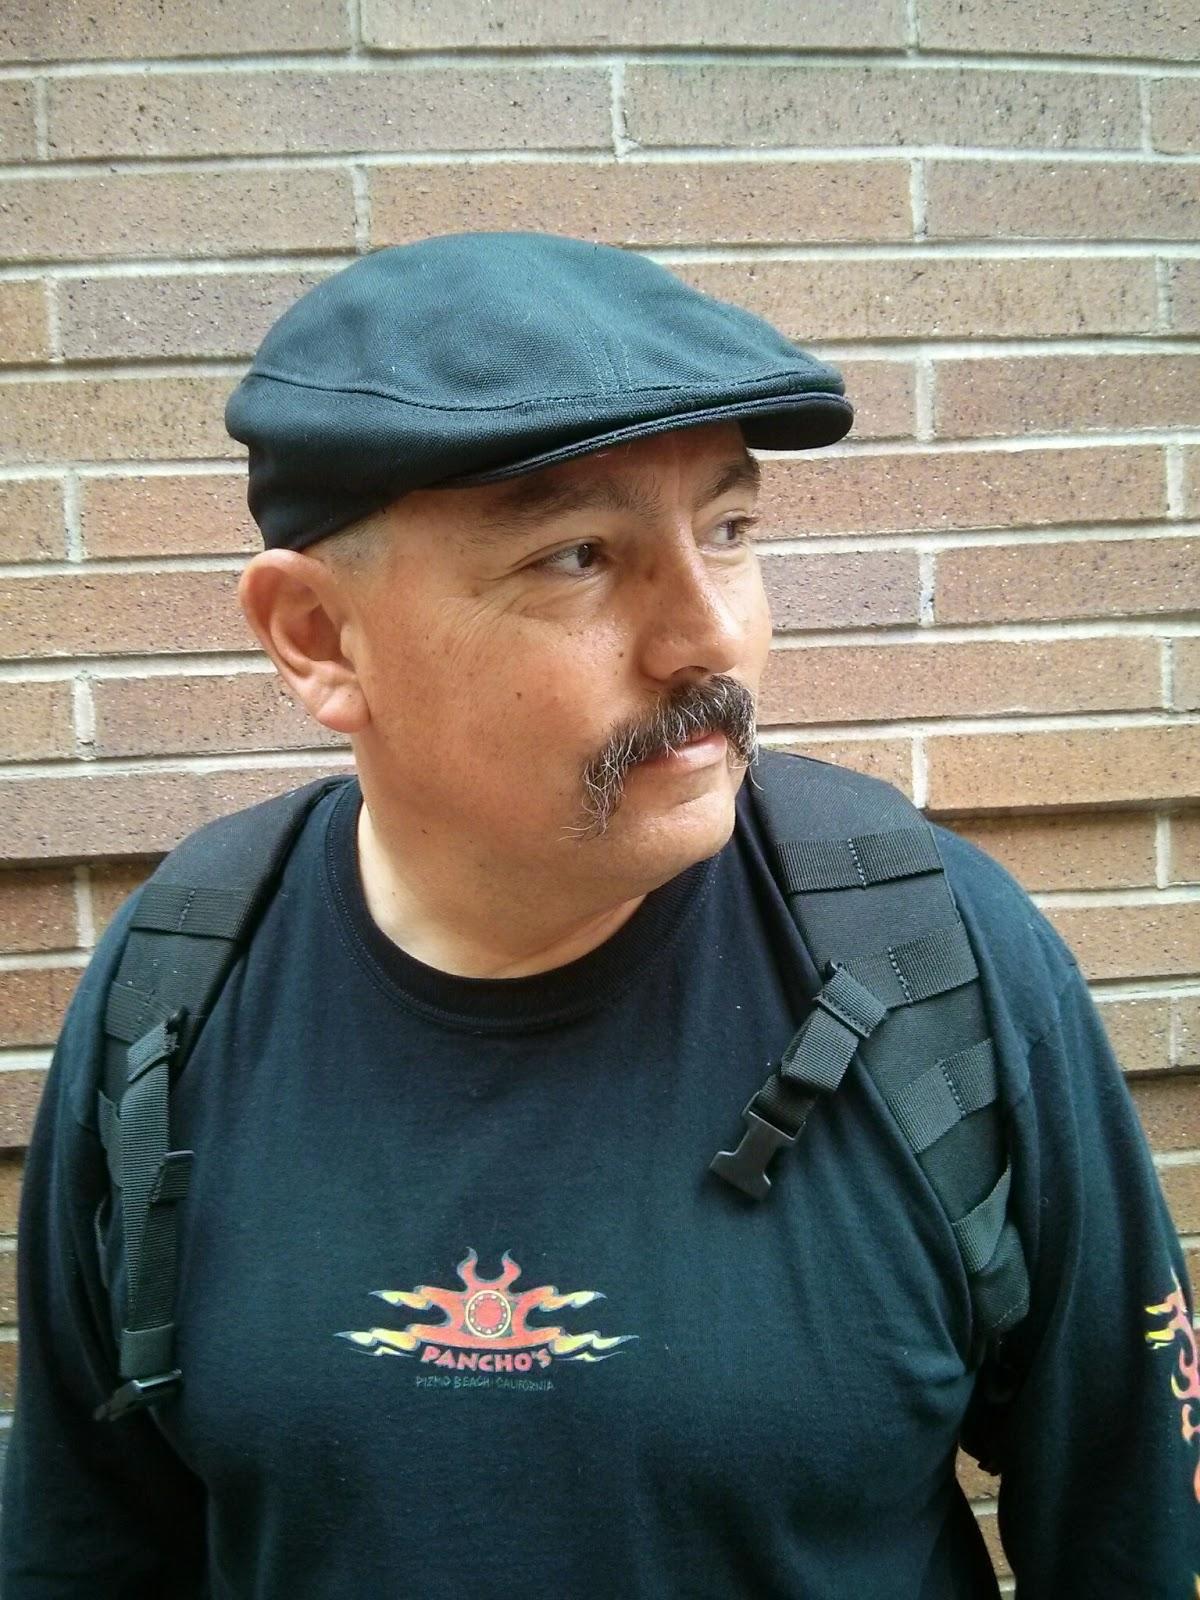 Newsie newsboy styled hats